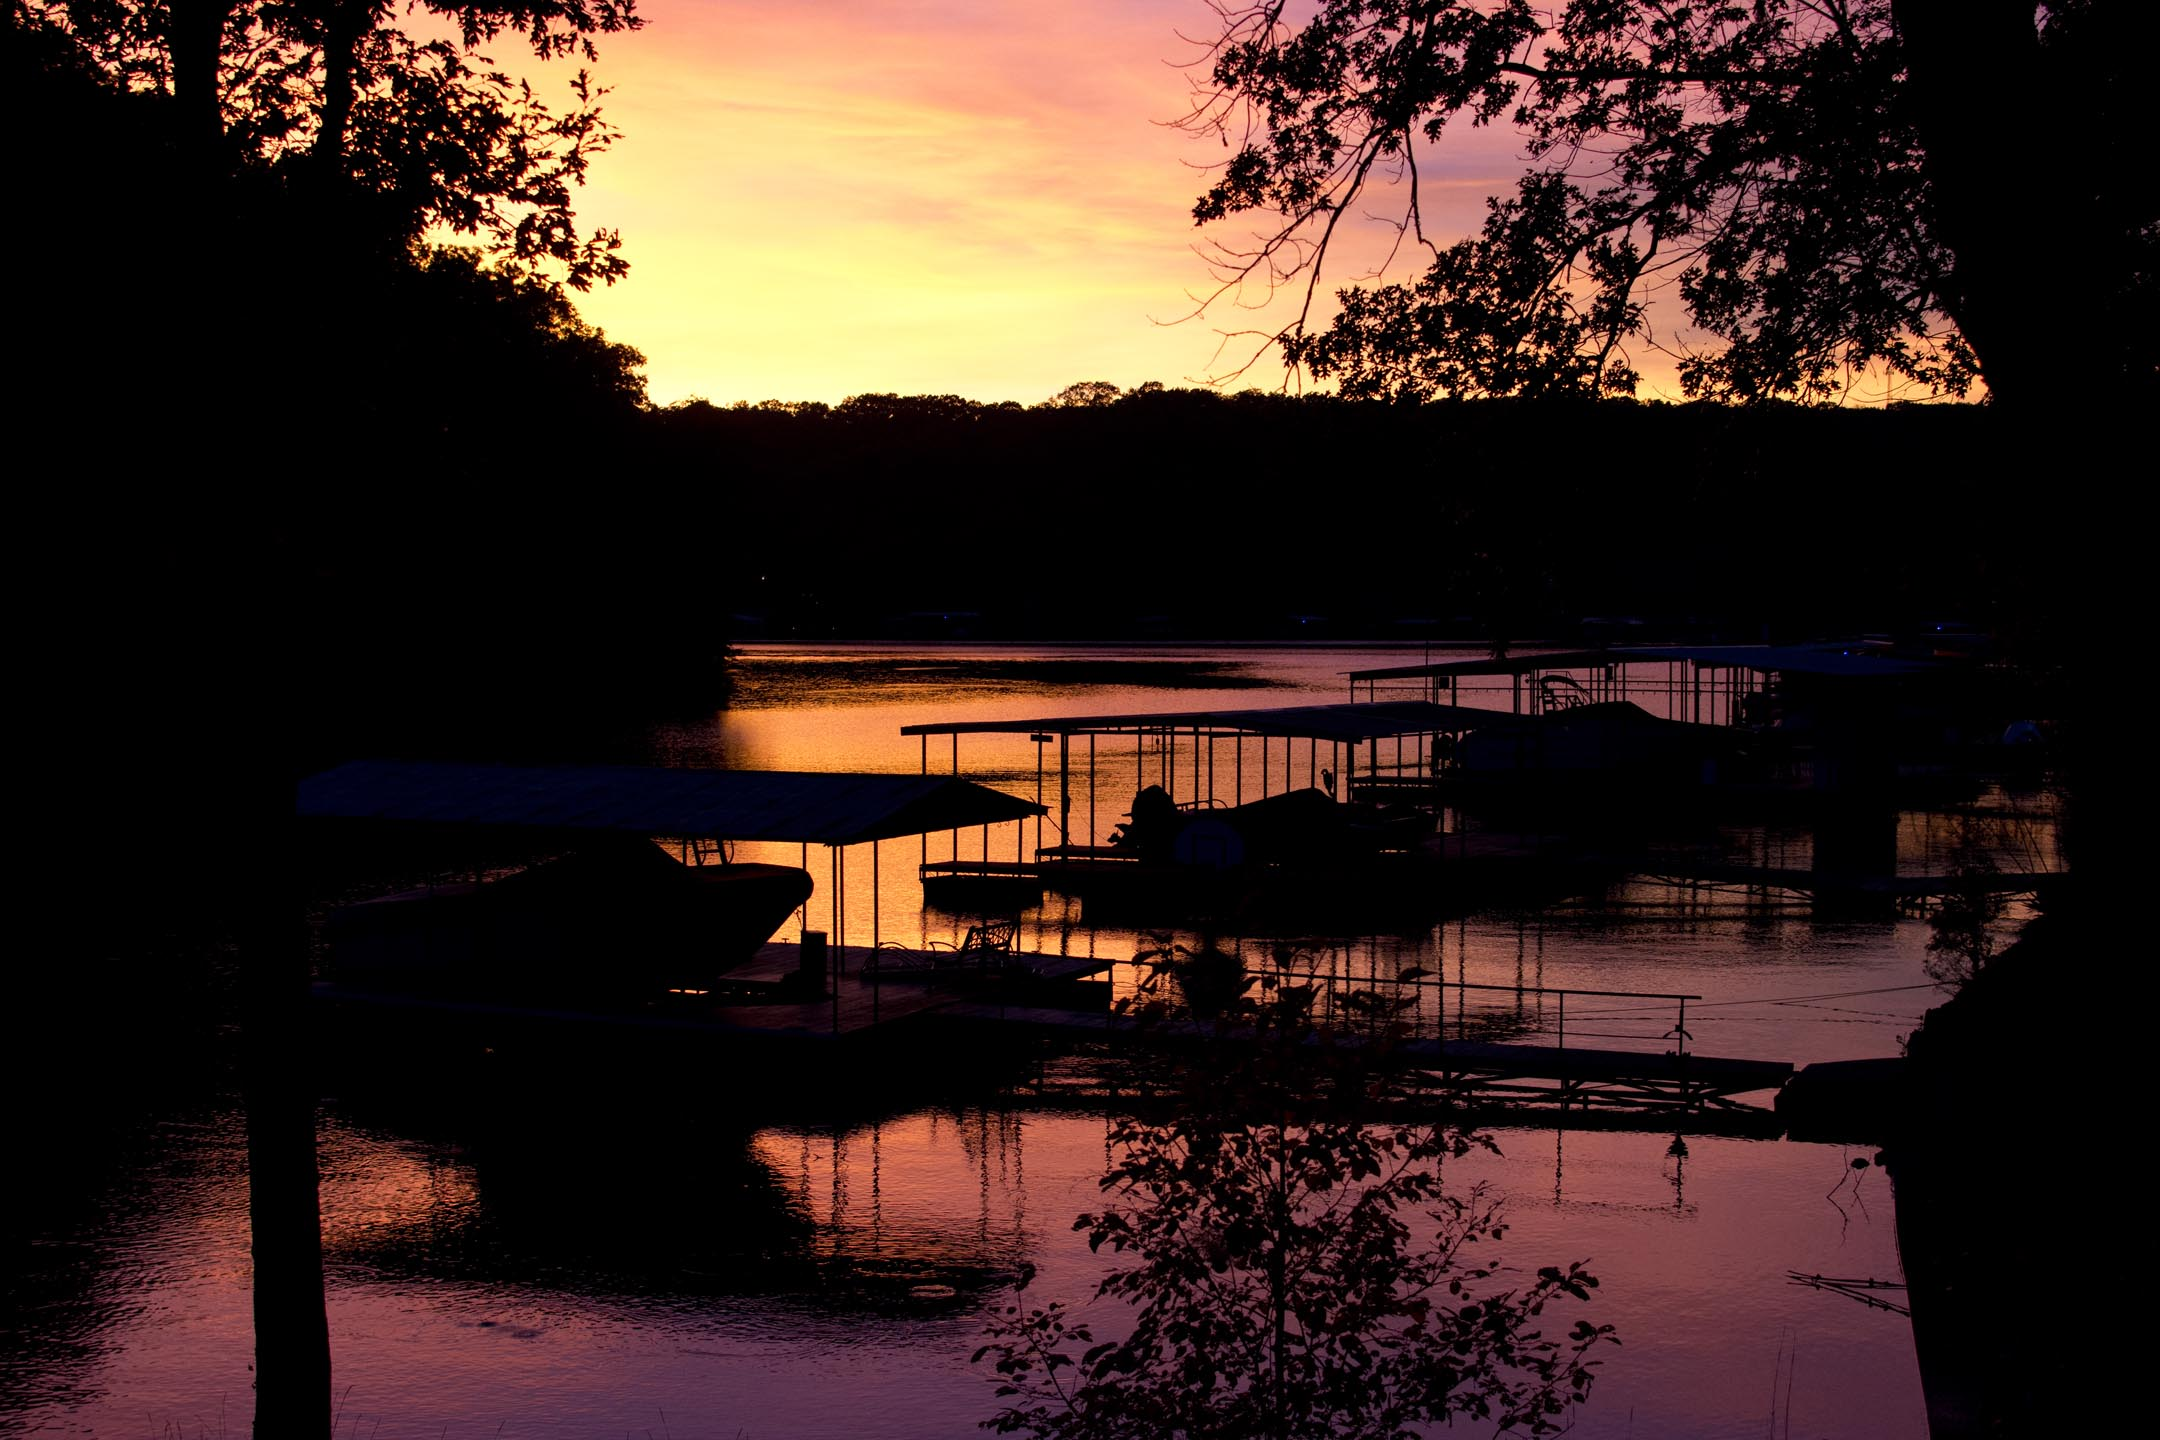 sunset2_lakehouse_10-10-15.jpg